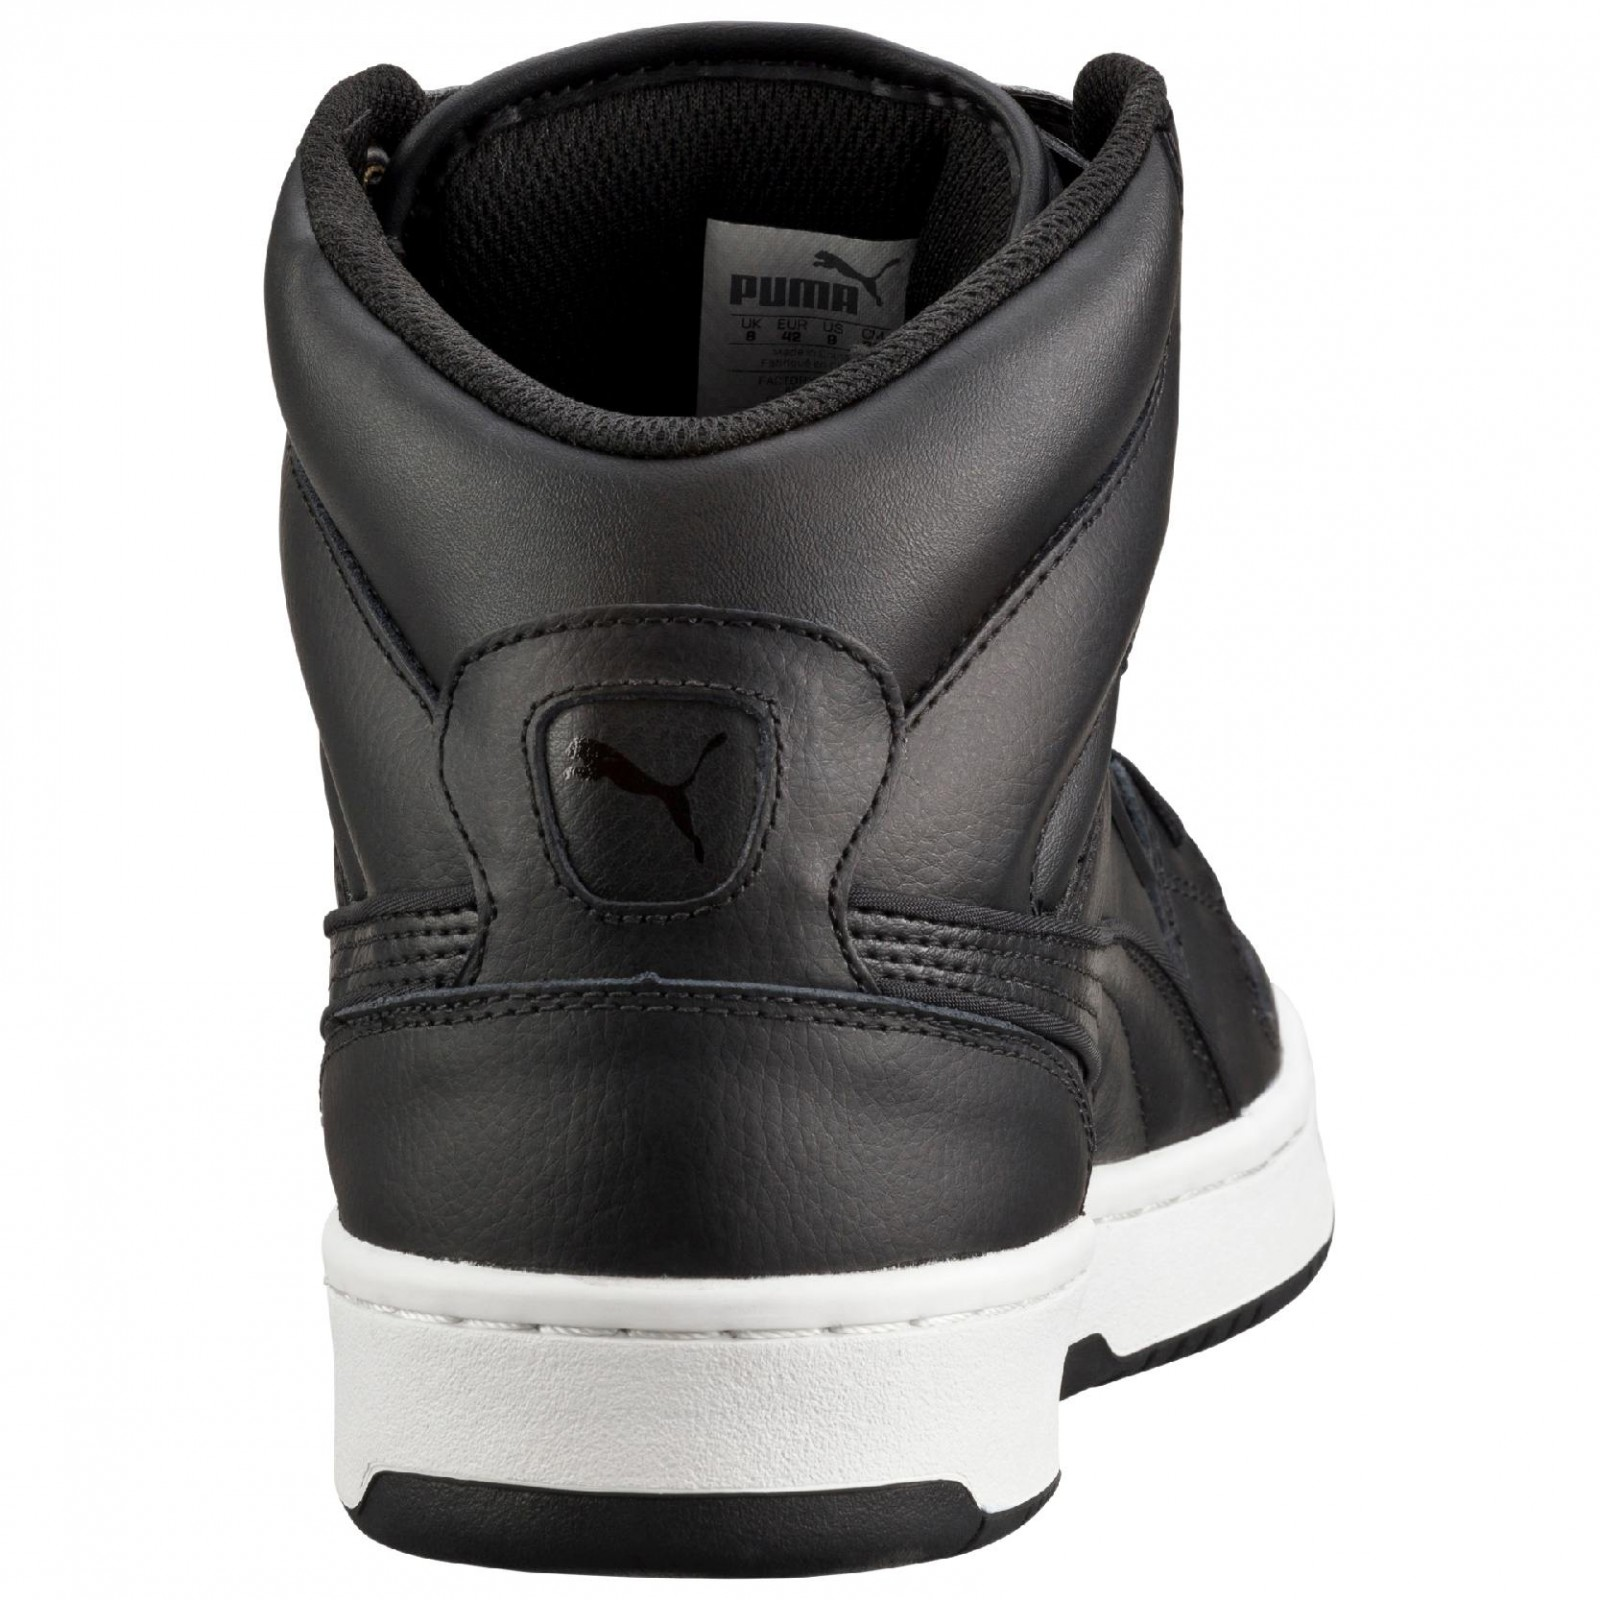 Dámské boty Puma Rebound Street L black-bl  c61fa15bf71